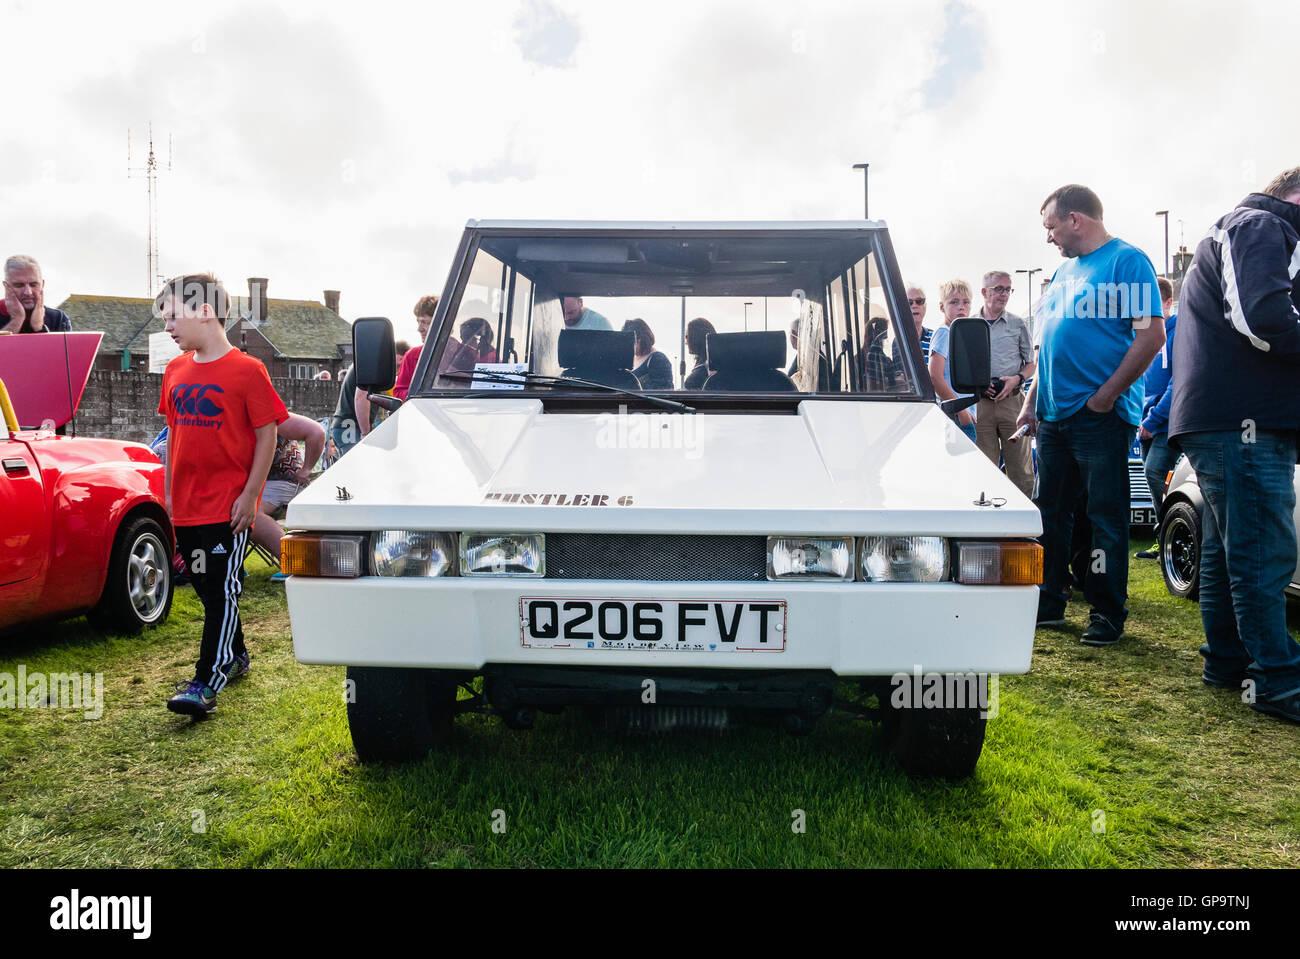 Hustler 6 6-wheeled kit car, based on a Mini, and designed by Aston Martin Lagonda's William Towns. - Stock Image